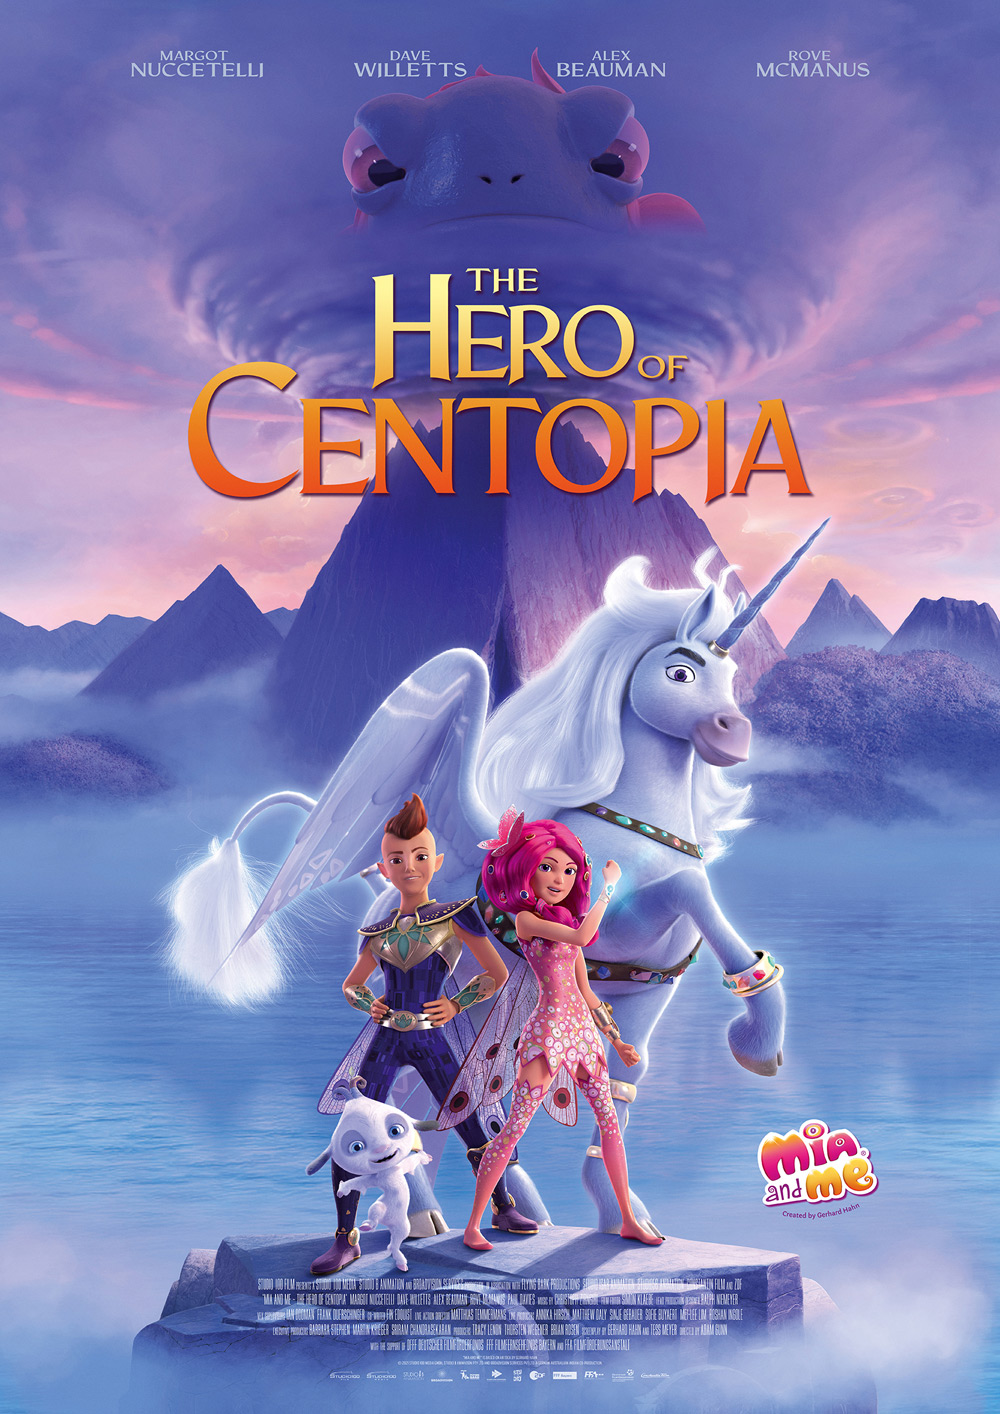 Mia and Me: The Hero of Centopia